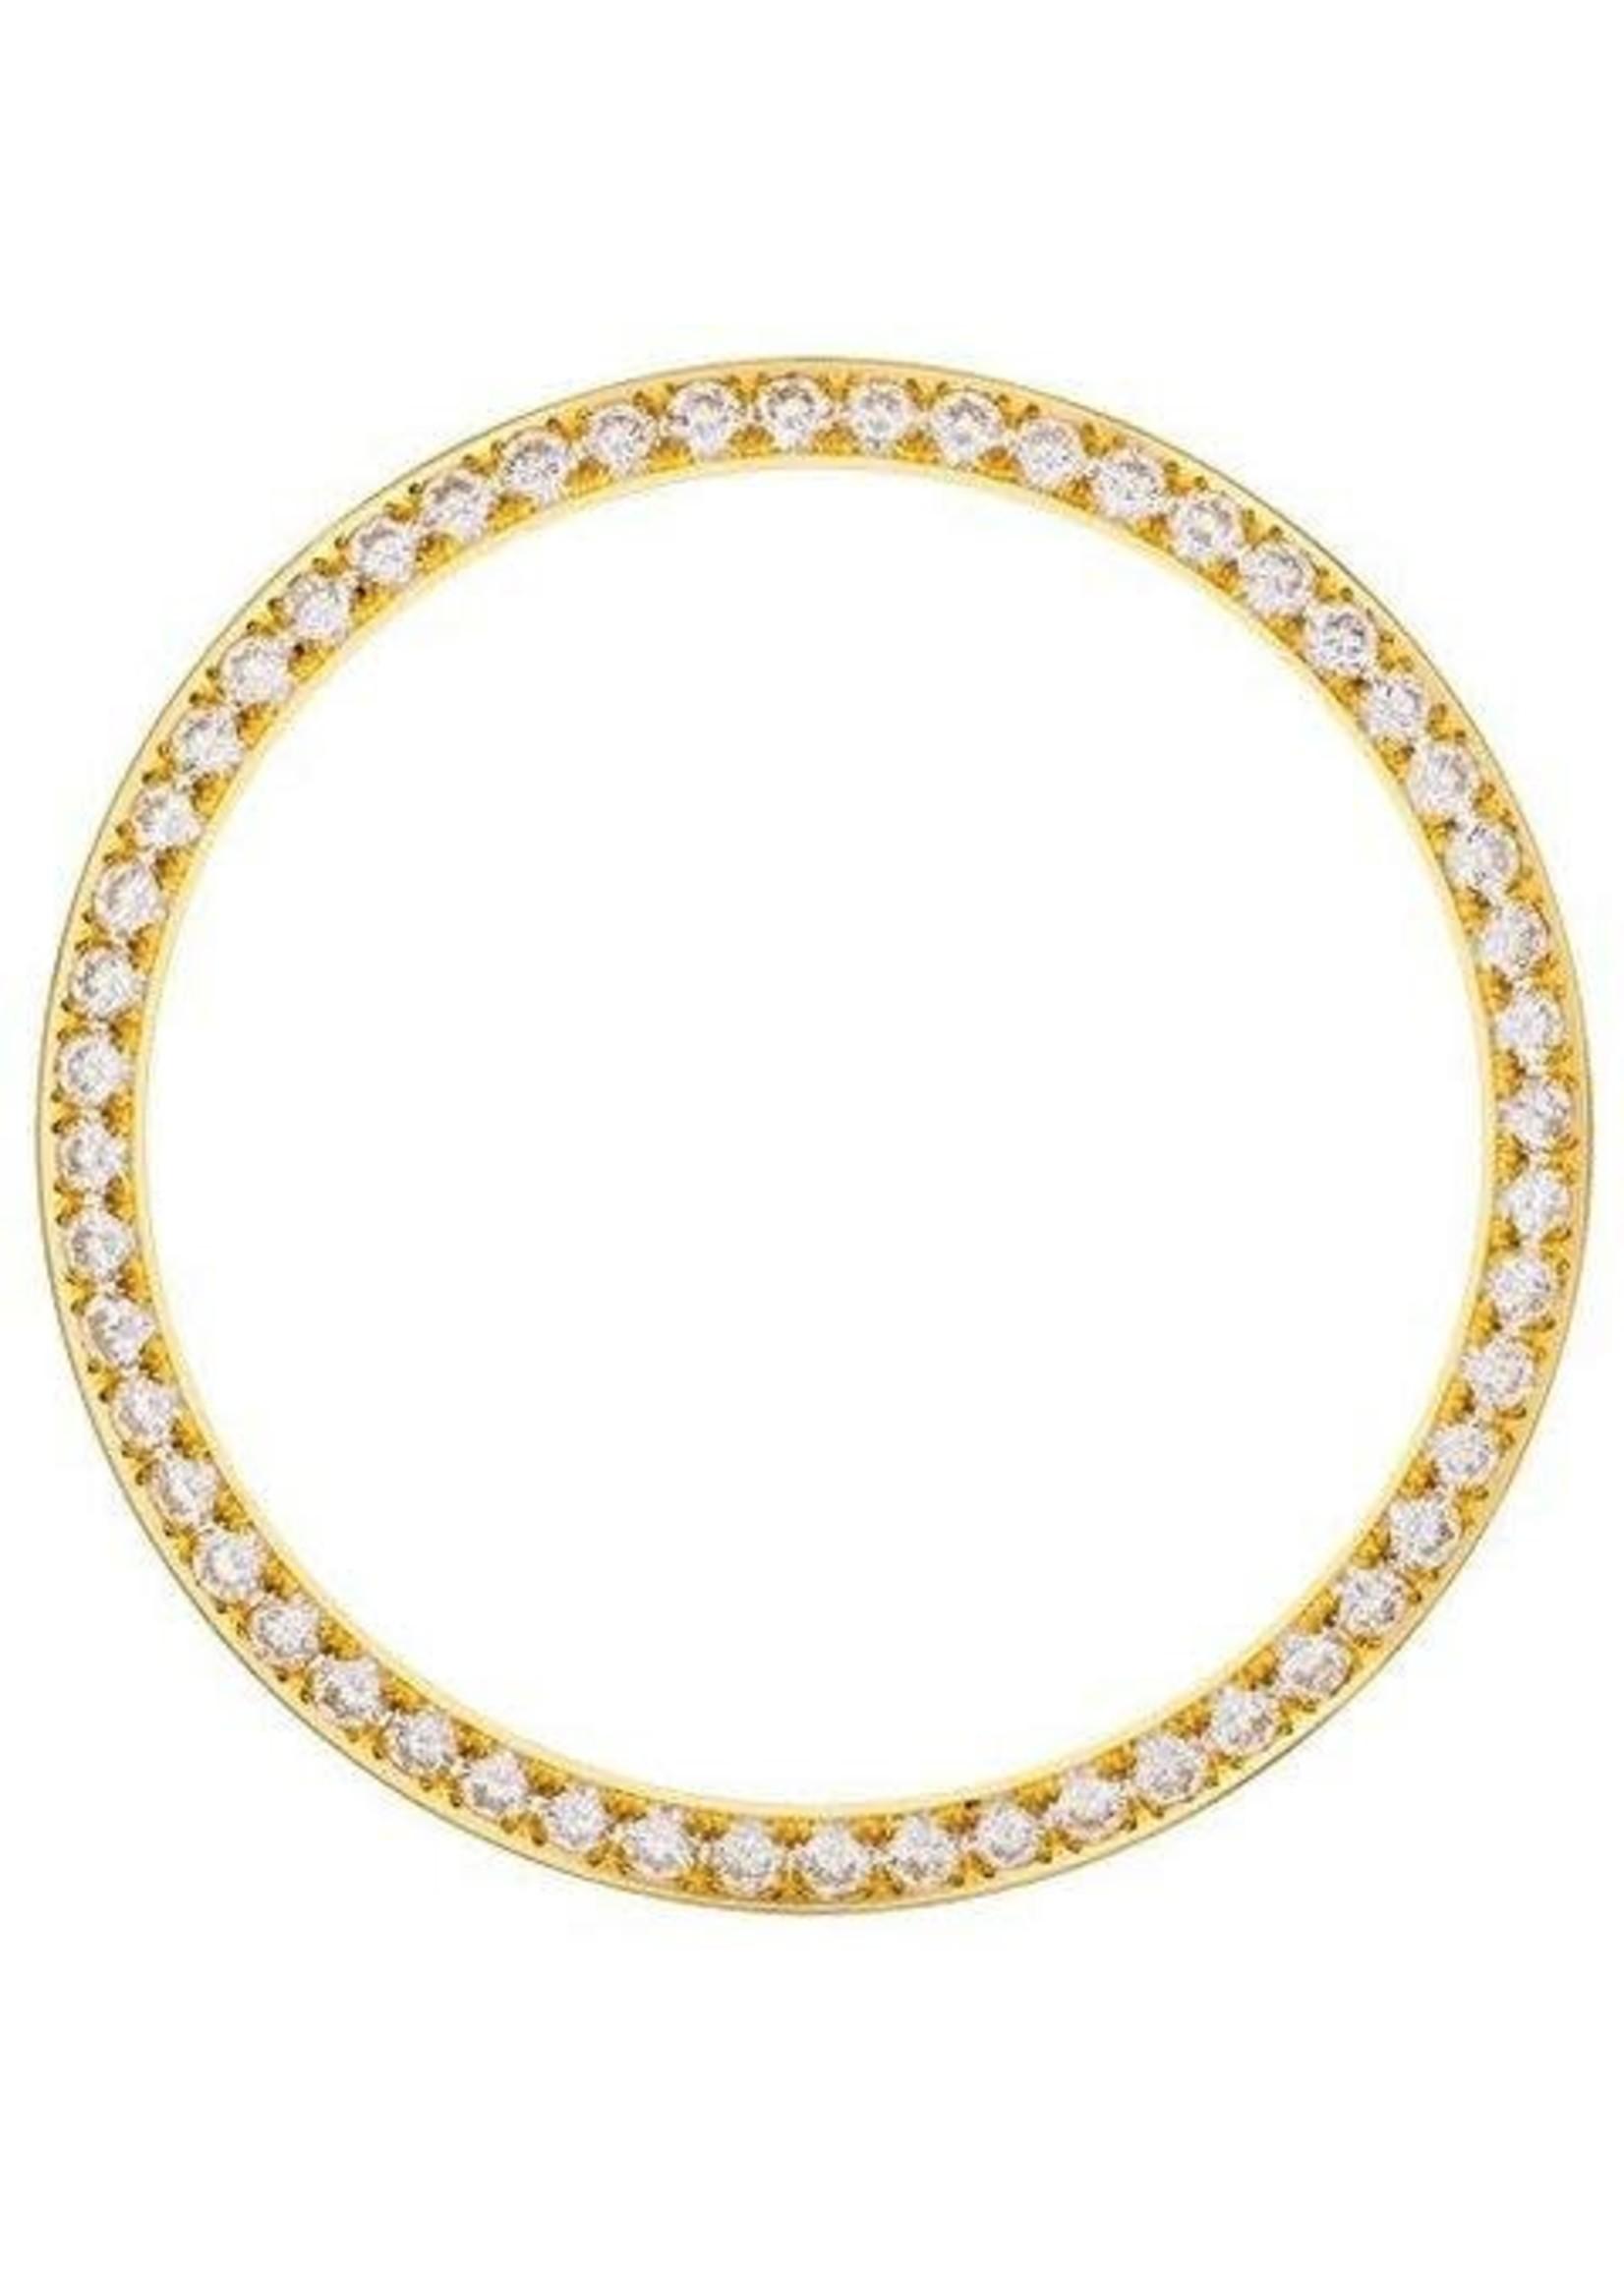 31MM DIAMOND BEZEL YELLOW GOLD